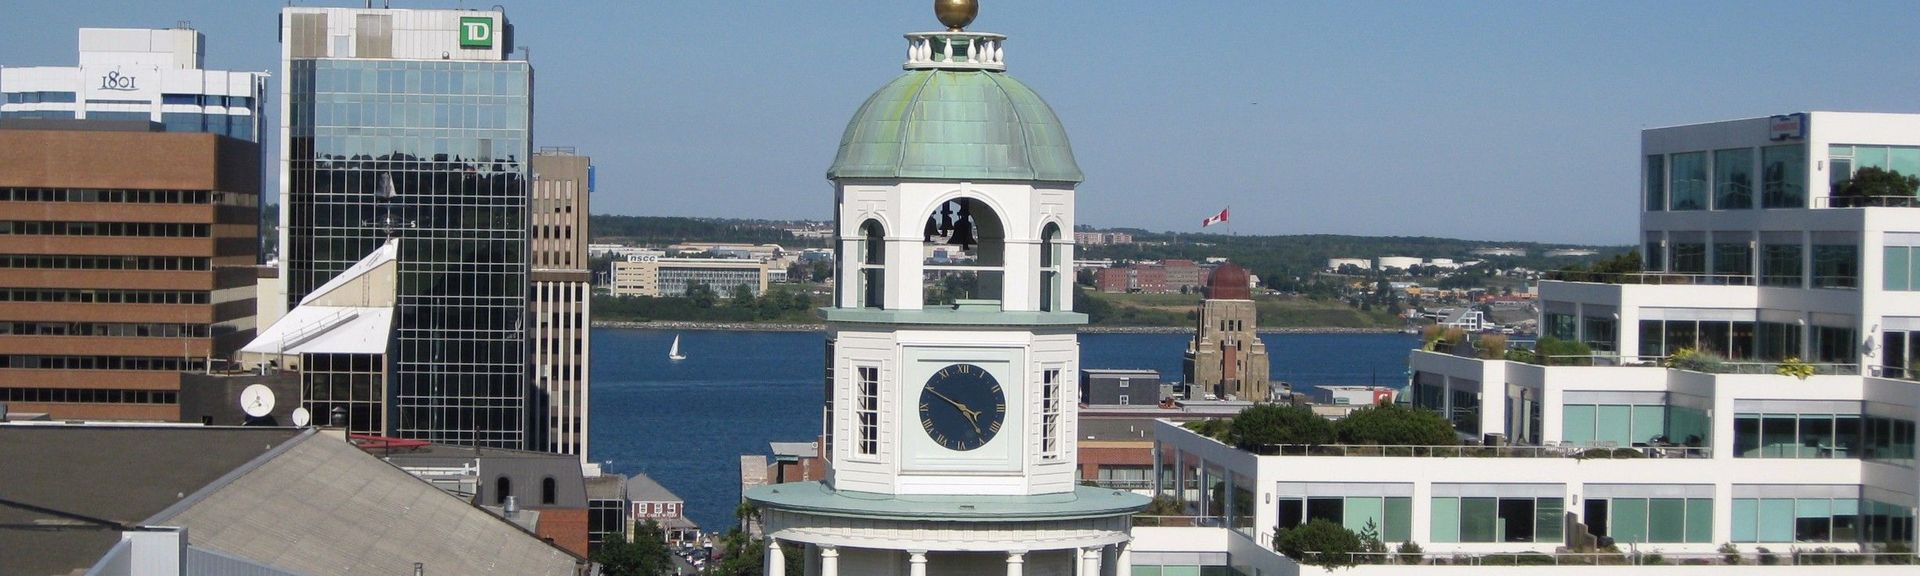 Downtown Halifax, Halifax, Nova Scotia, CA